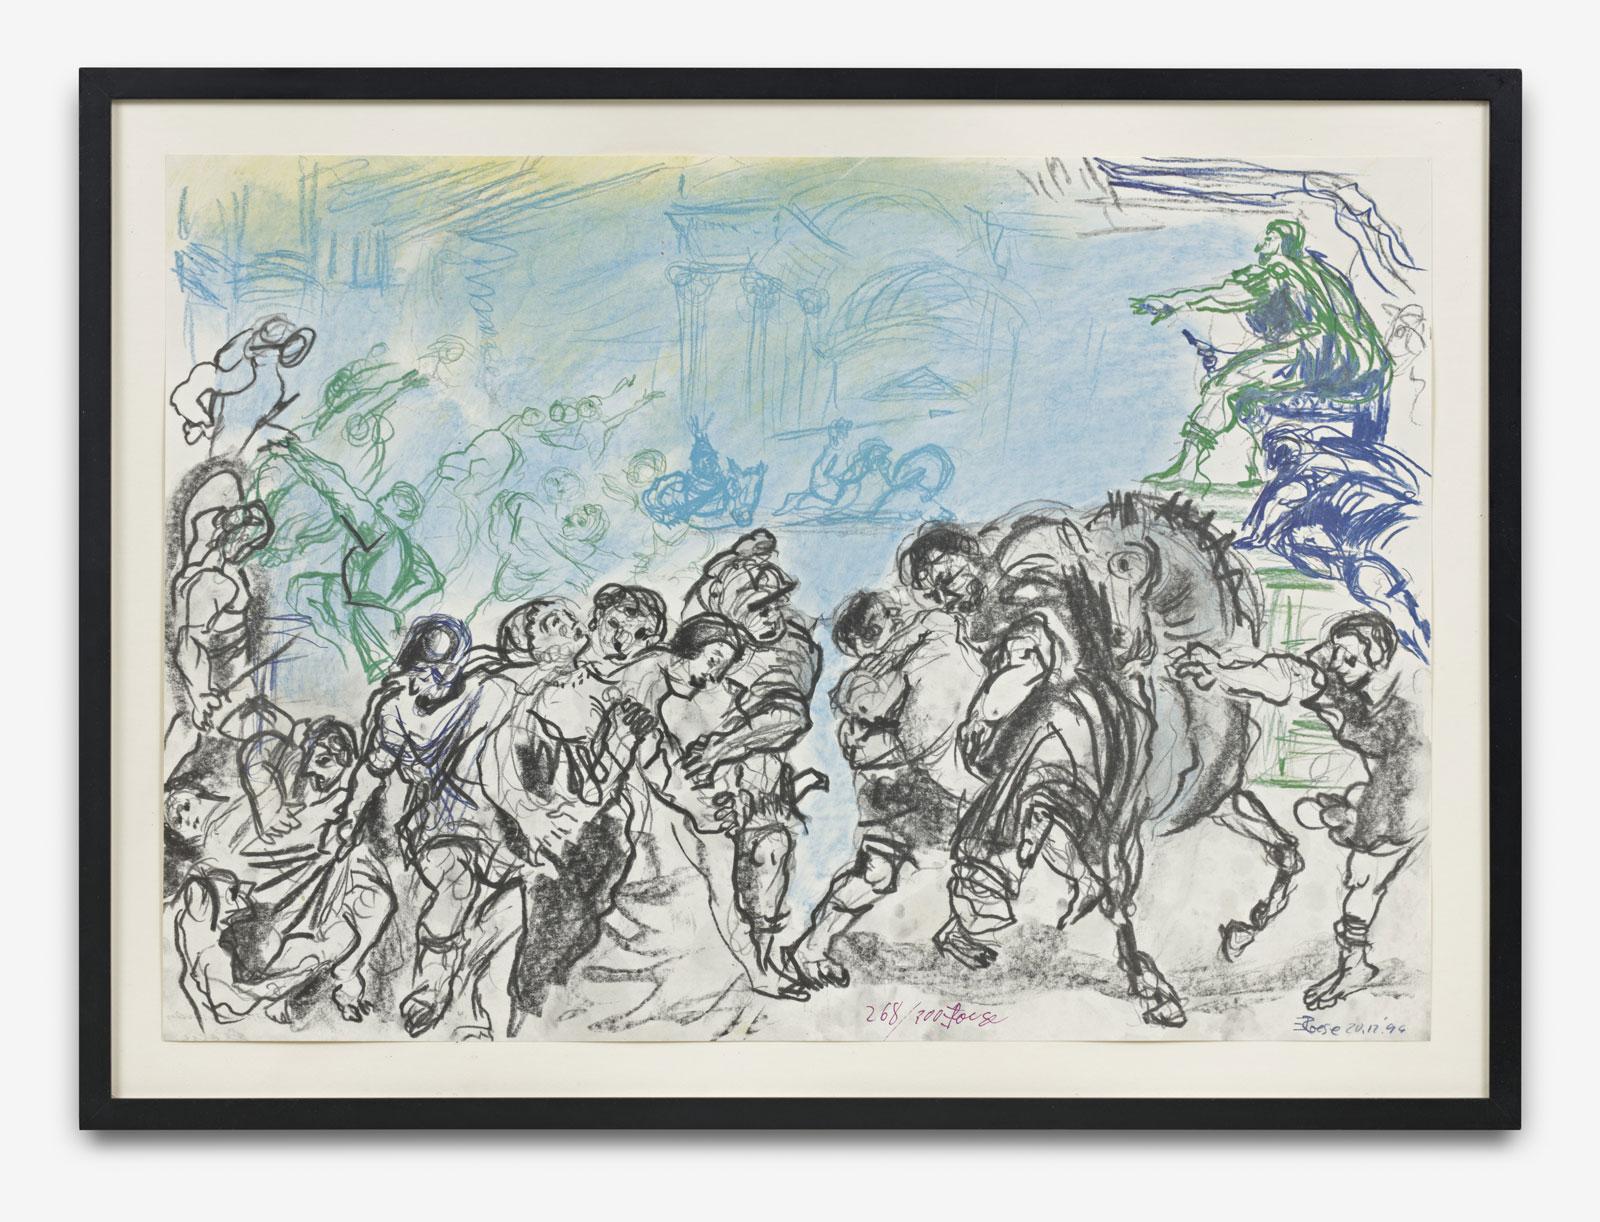 Roese, Eckhart - o.T. (Tanzszene) - 1996